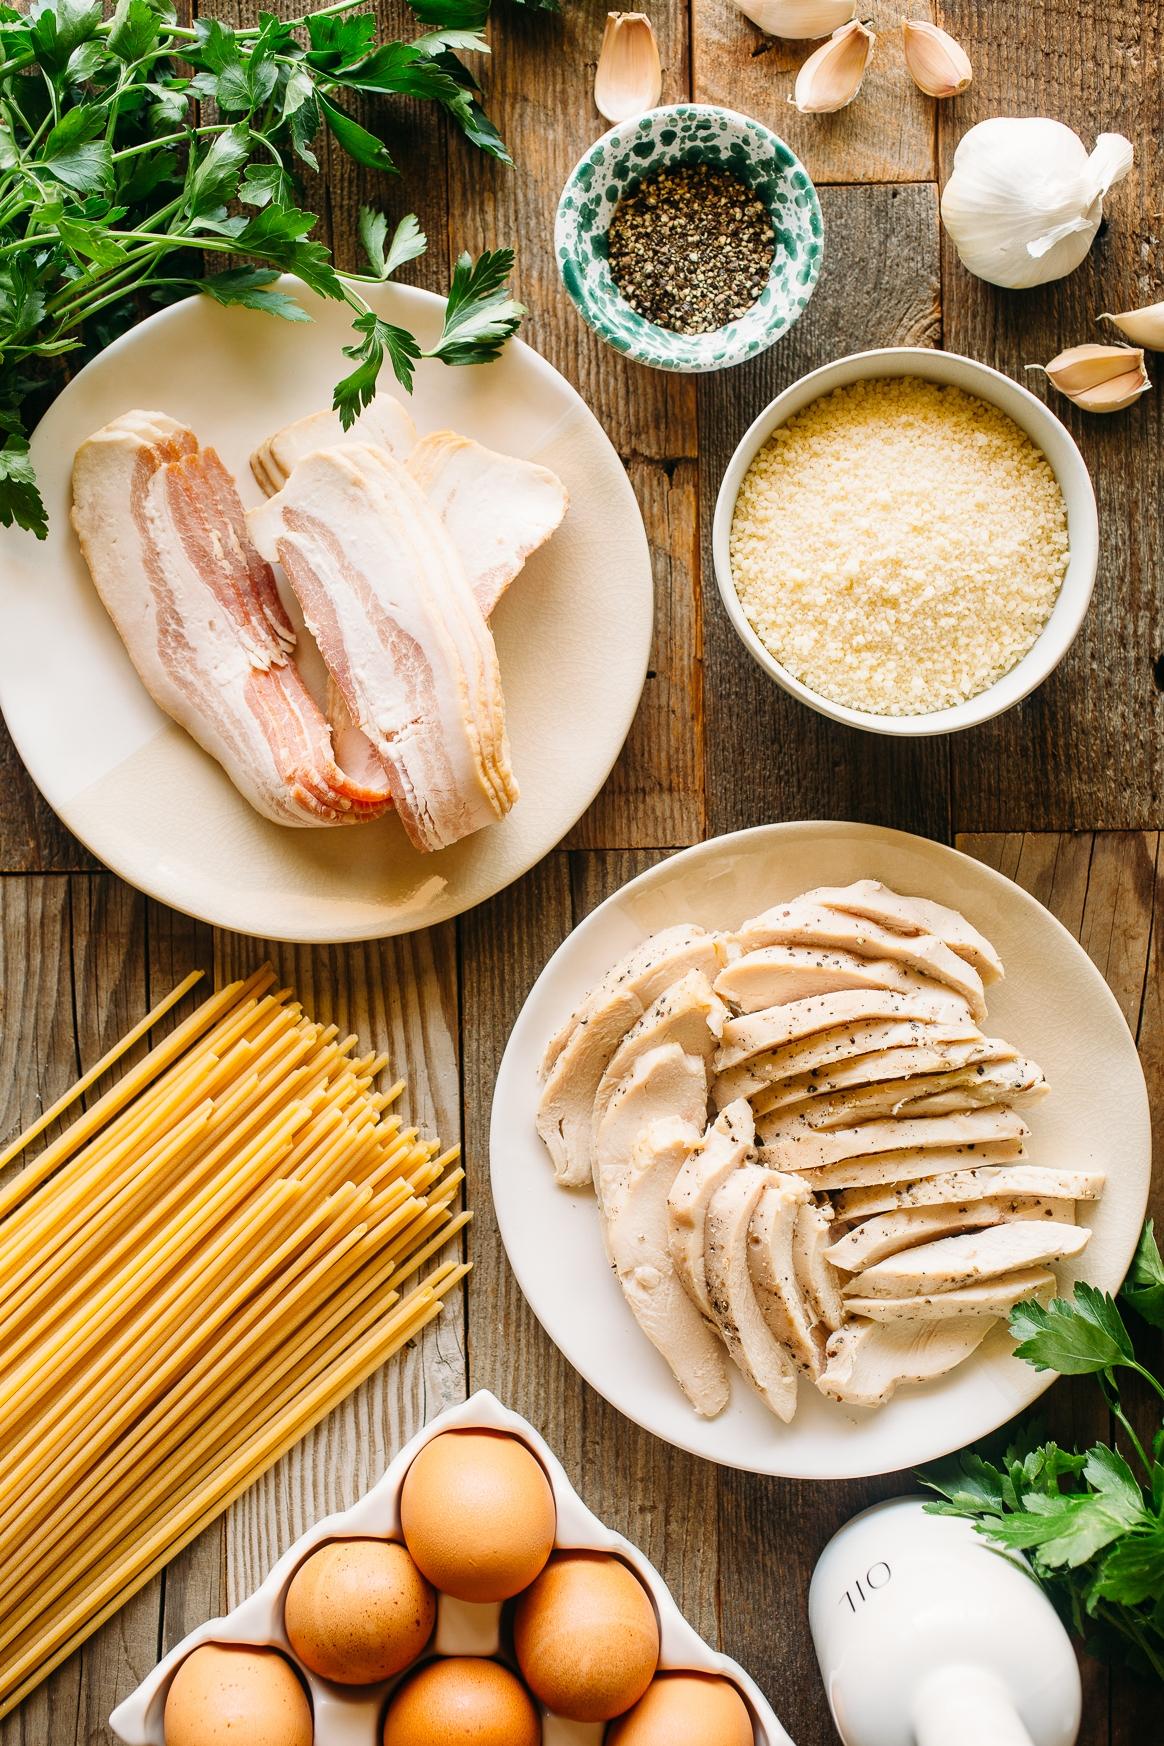 Chicken Carbonara Ingredients